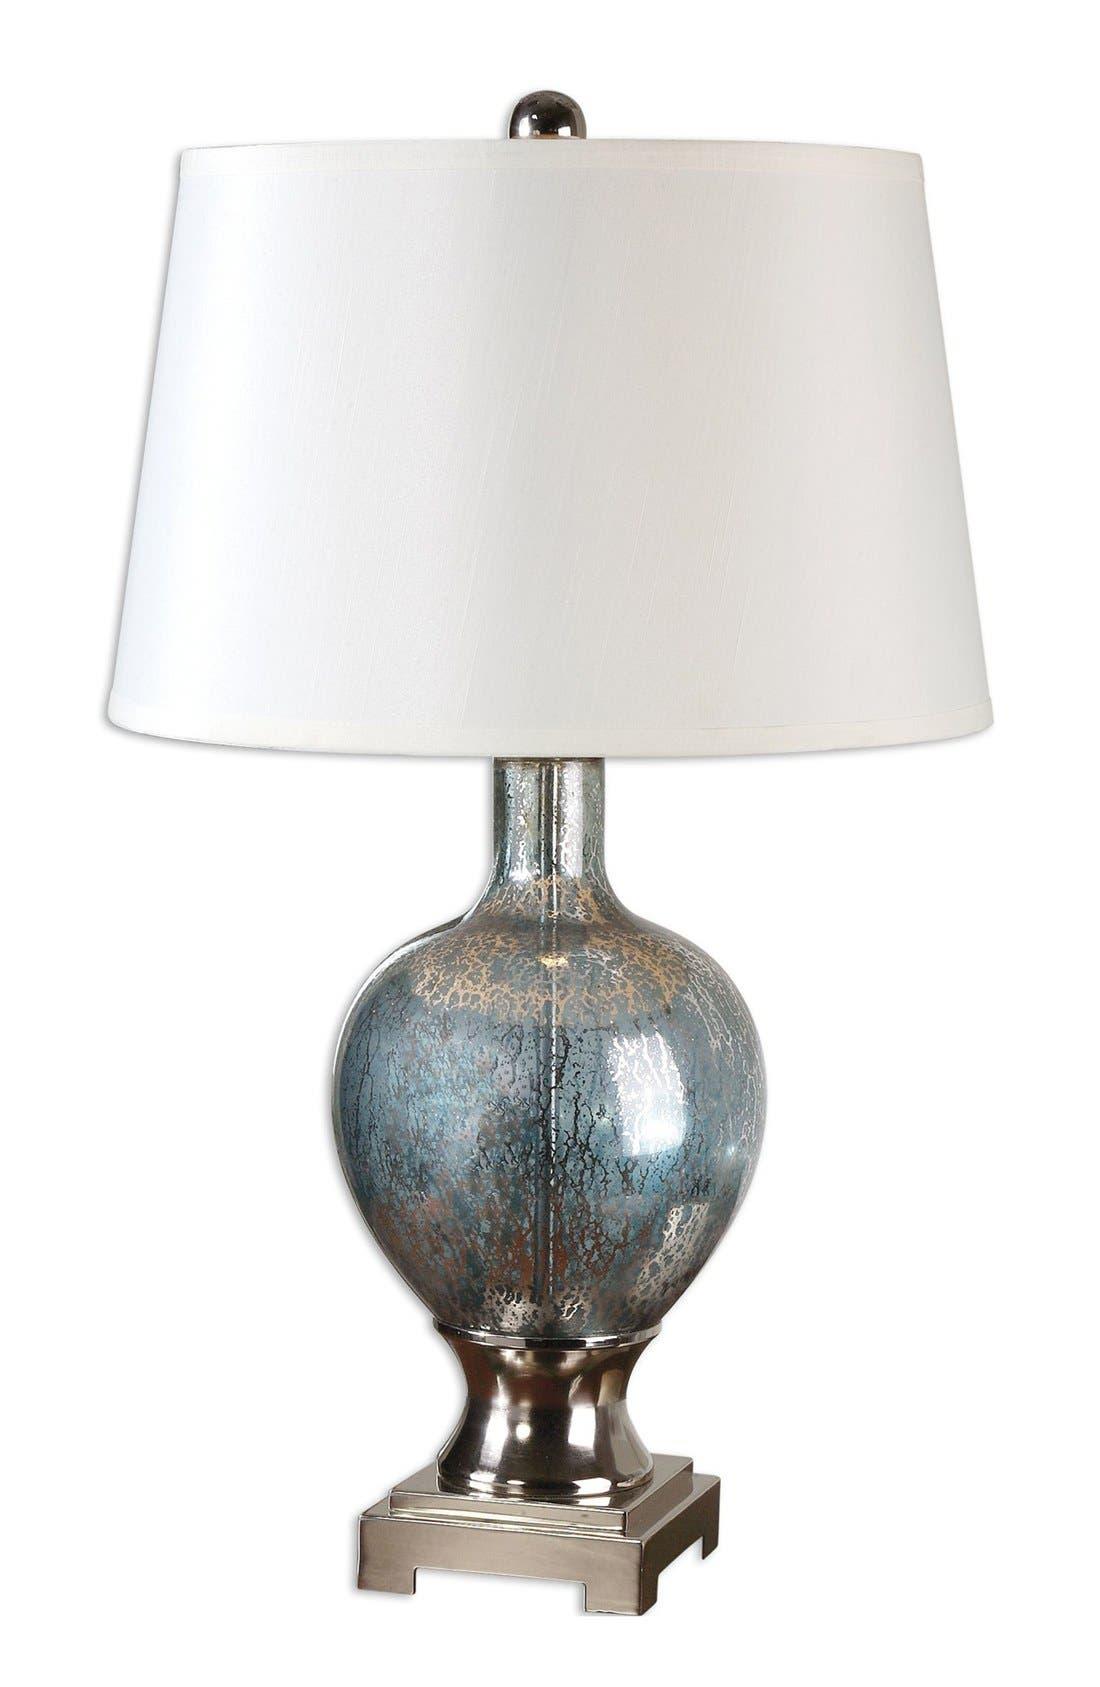 Main Image - Uttermost 'Mafalda' Mercury Glass Table Lamp